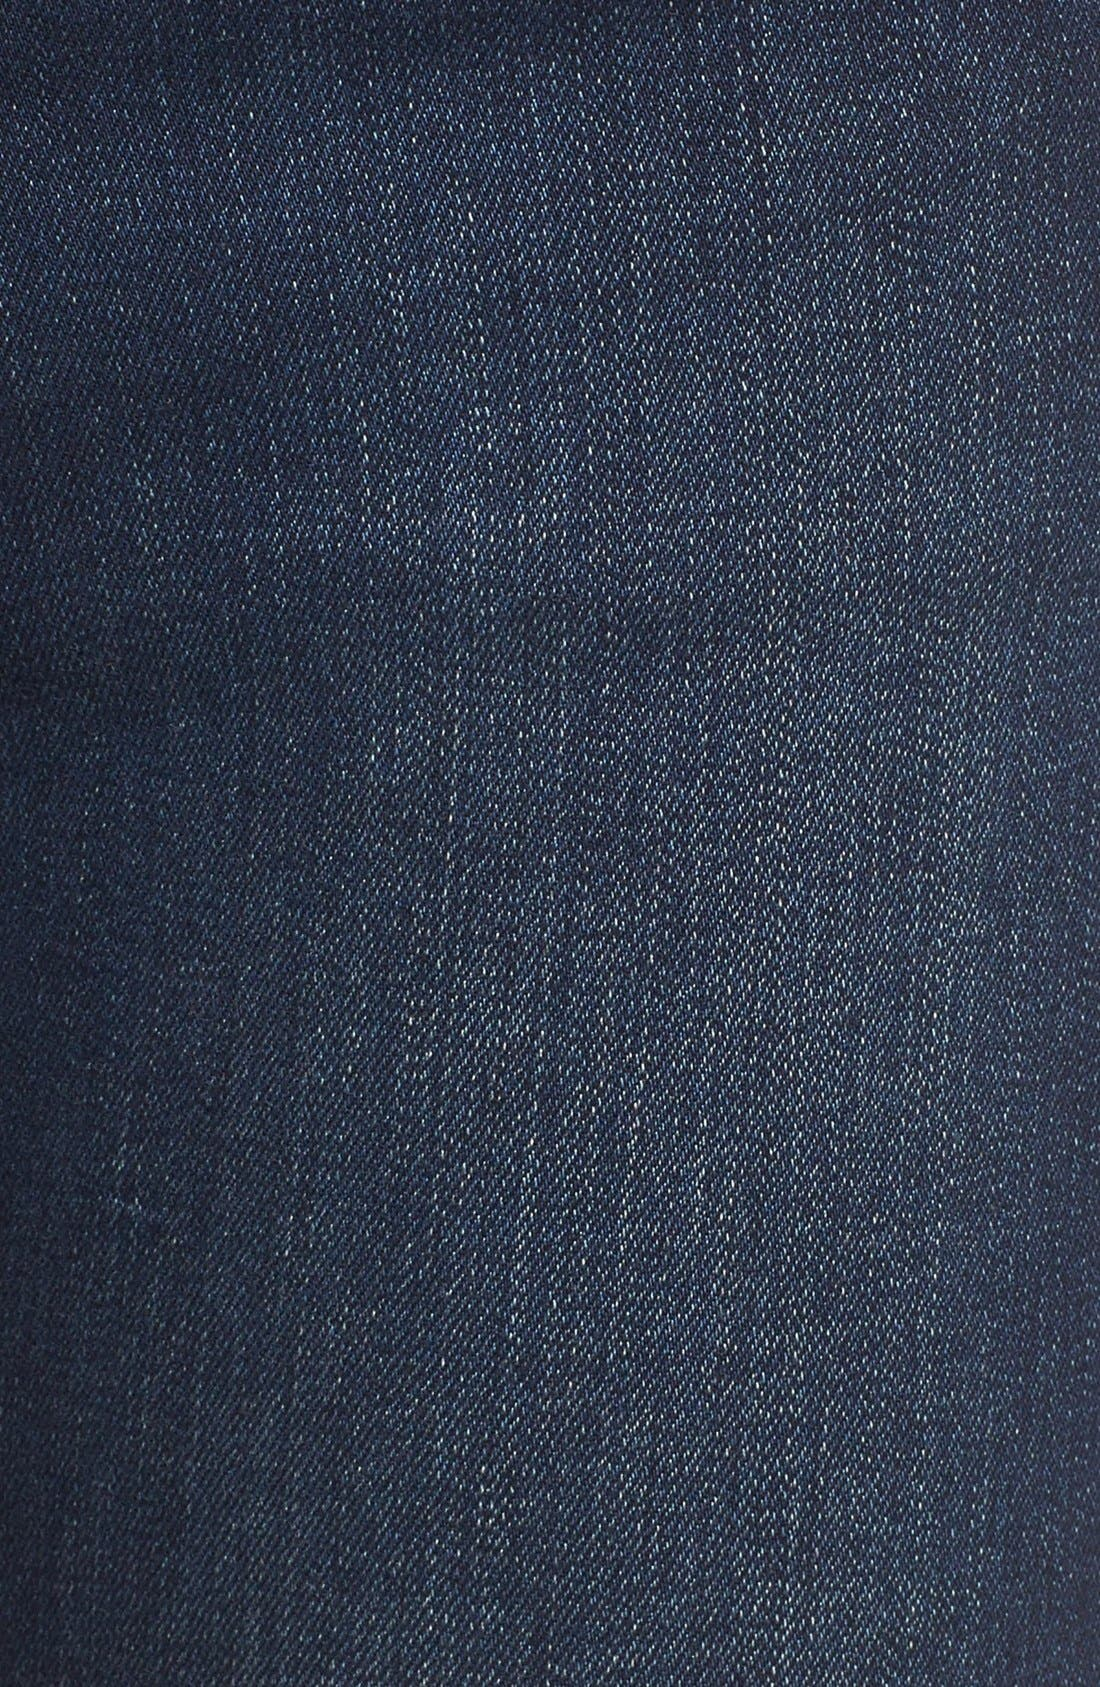 JAMES JEANS,                             'Shayebel' Flare Denim Trousers,                             Alternate thumbnail 5, color,                             401